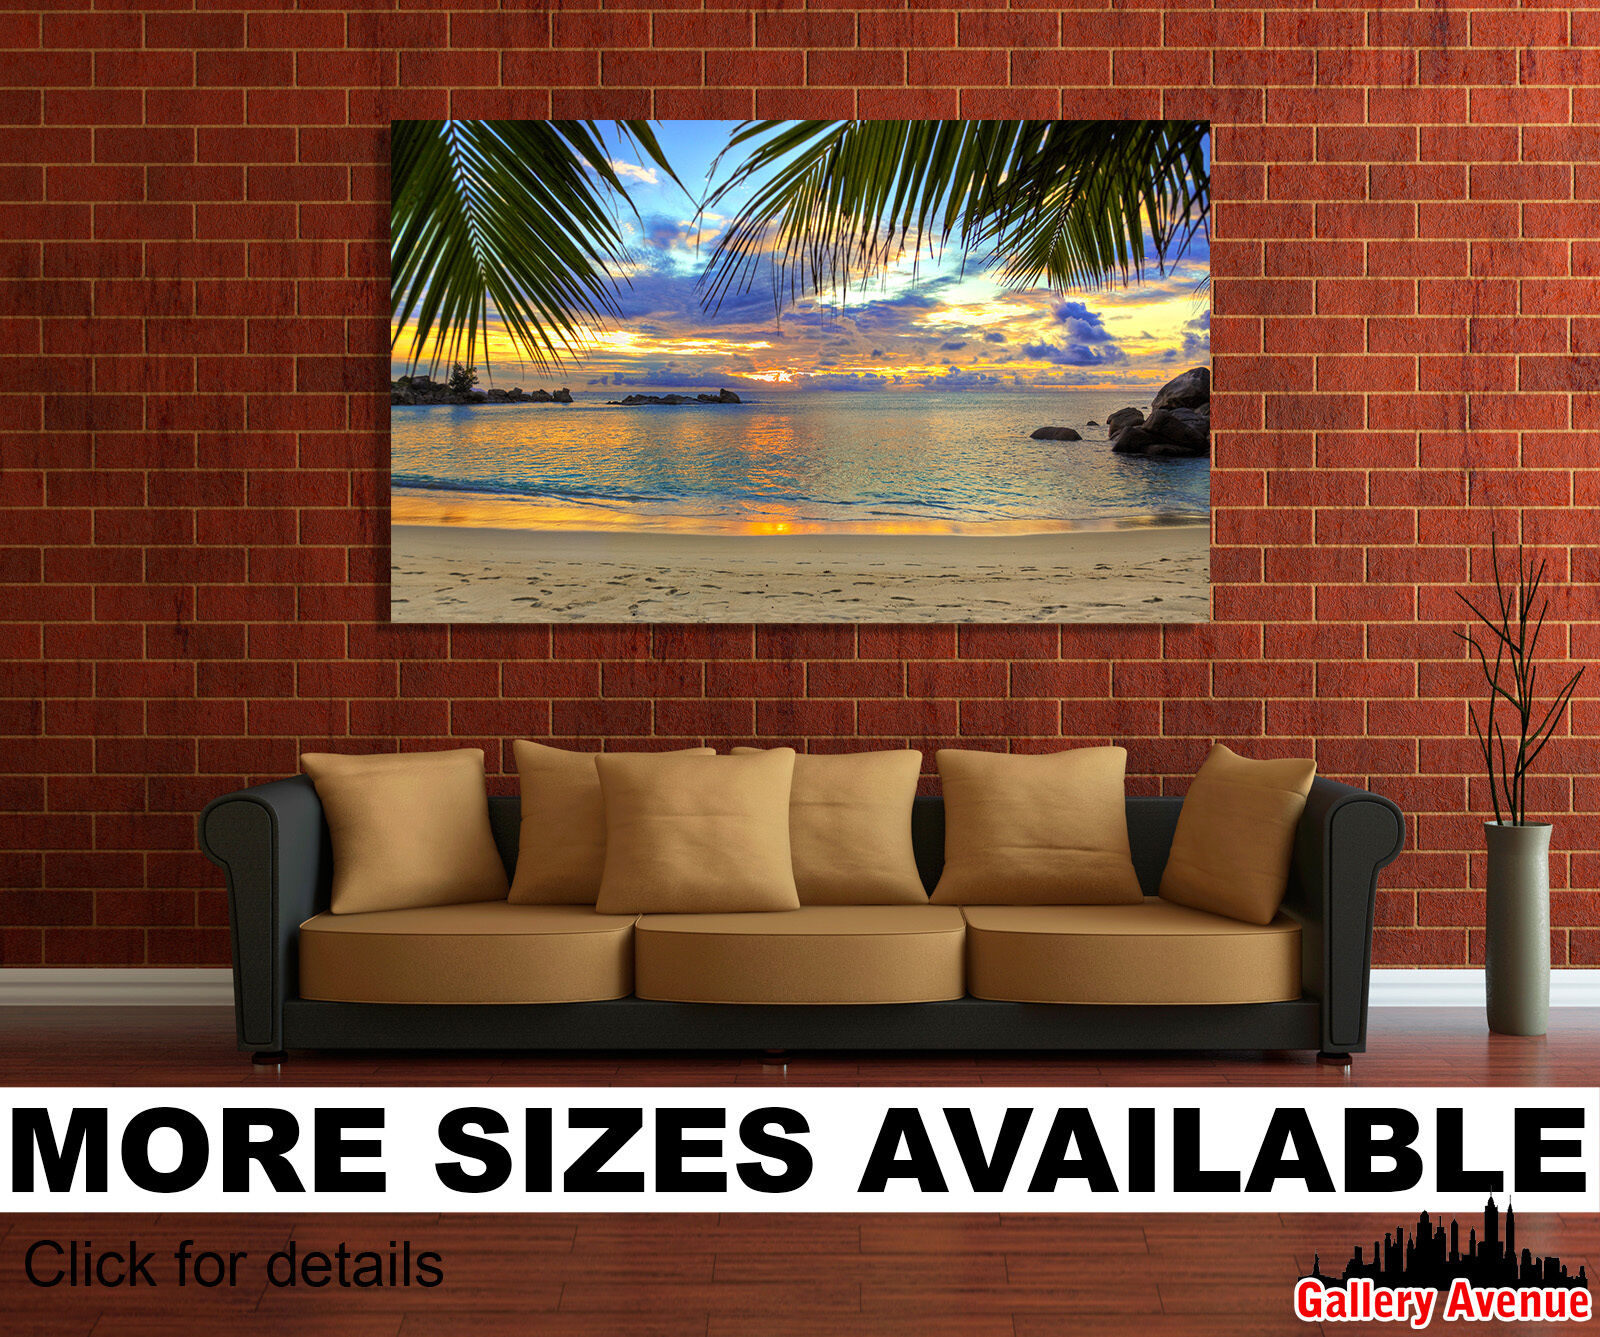 Wall Art Canvas Picture Print - Beach Tropics Sea Sand Palm Trees 3.2